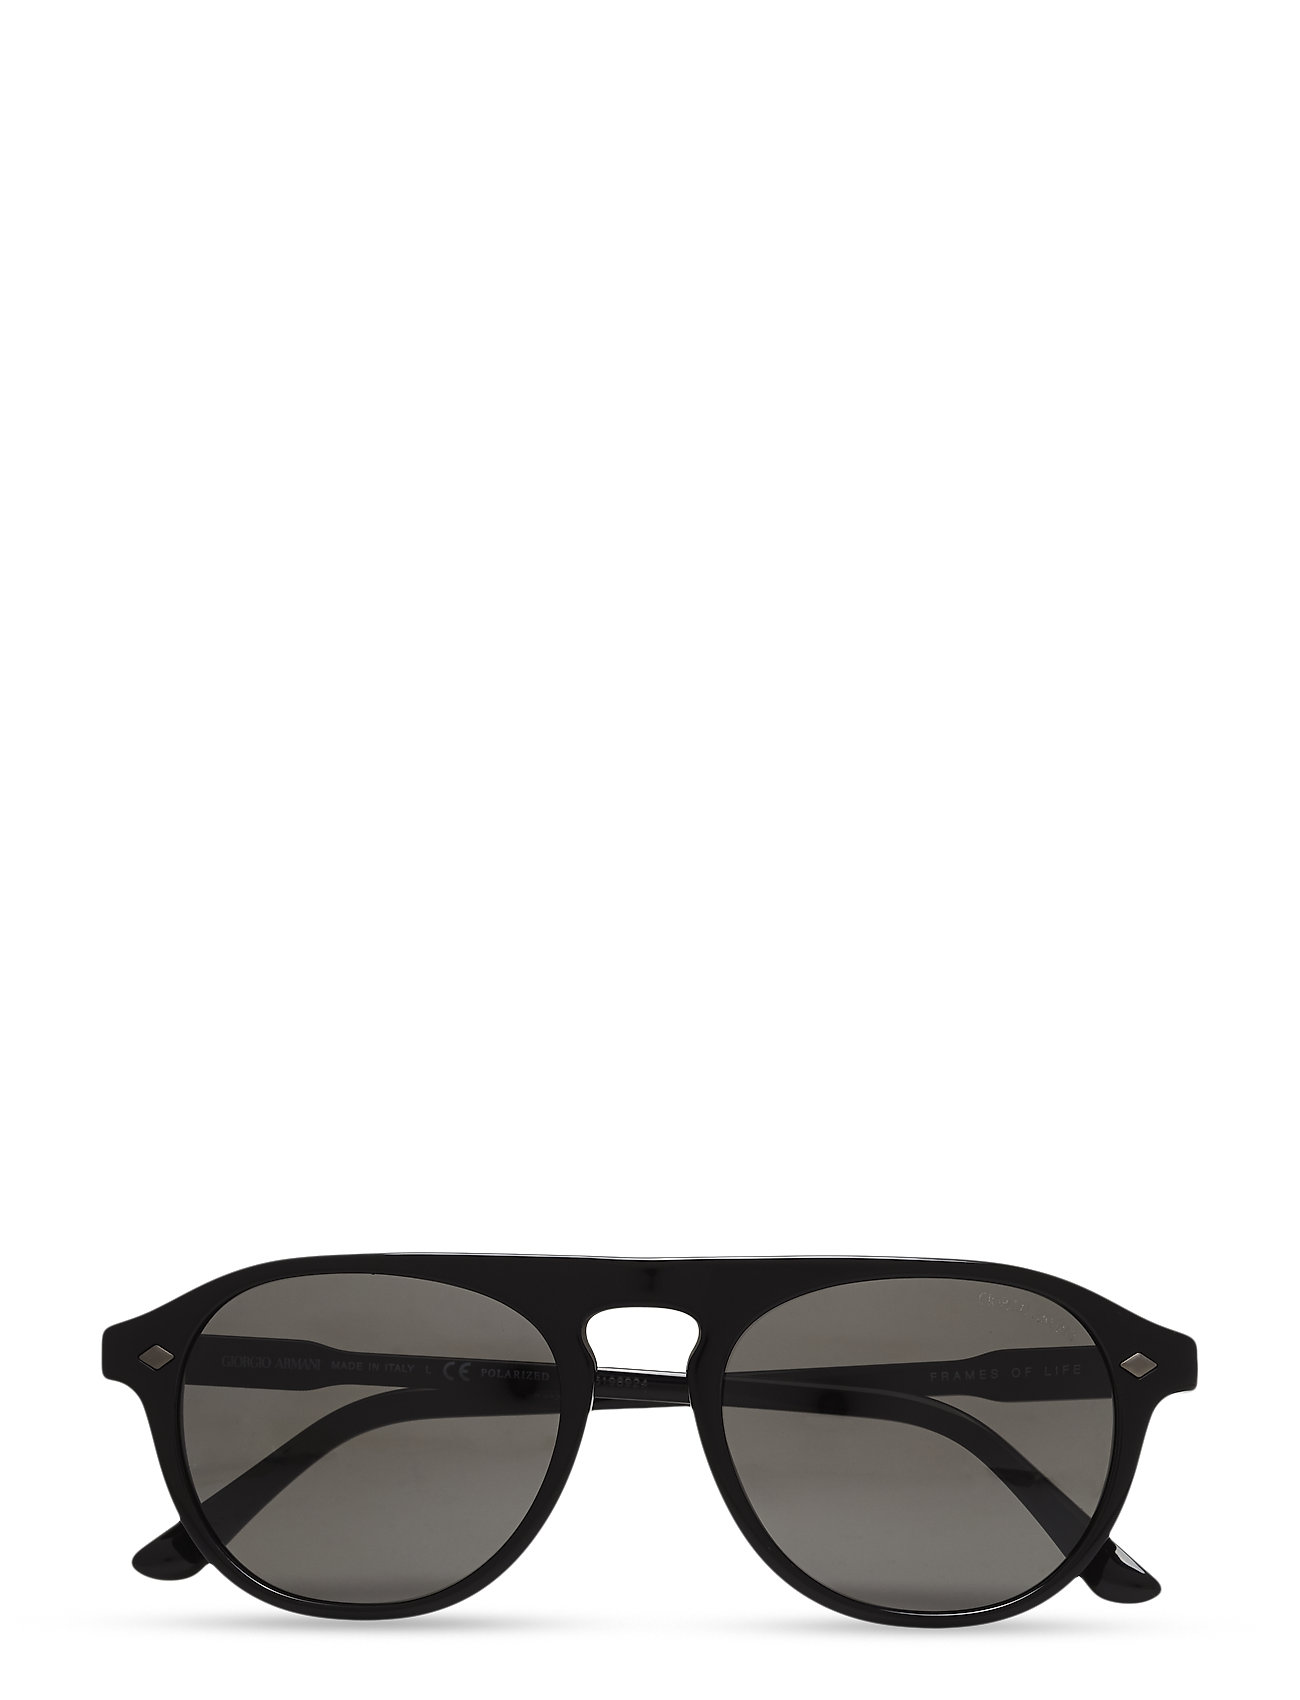 Frames Of Life Giorgio Armani Sunglasses Solbriller til Herrer i Sort